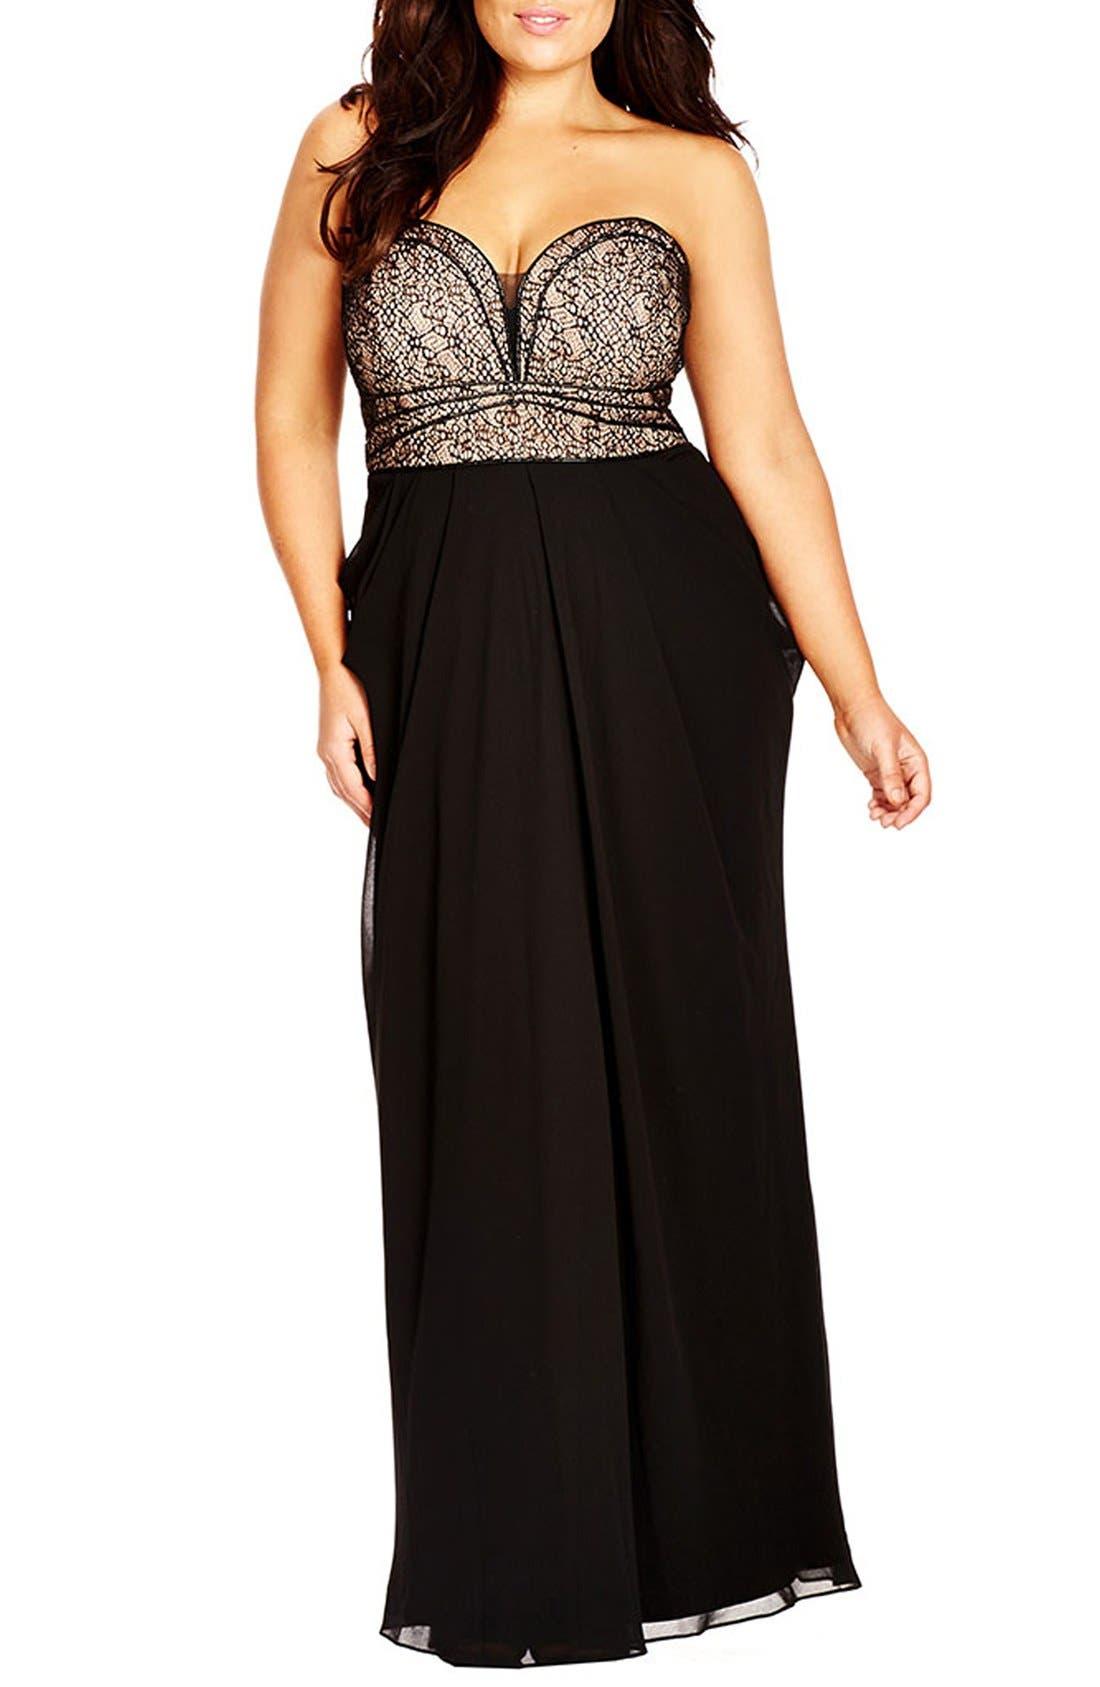 CITY CHIC, Motown Strapless Lace & Chiffon Maxi Dress, Main thumbnail 1, color, BLACK